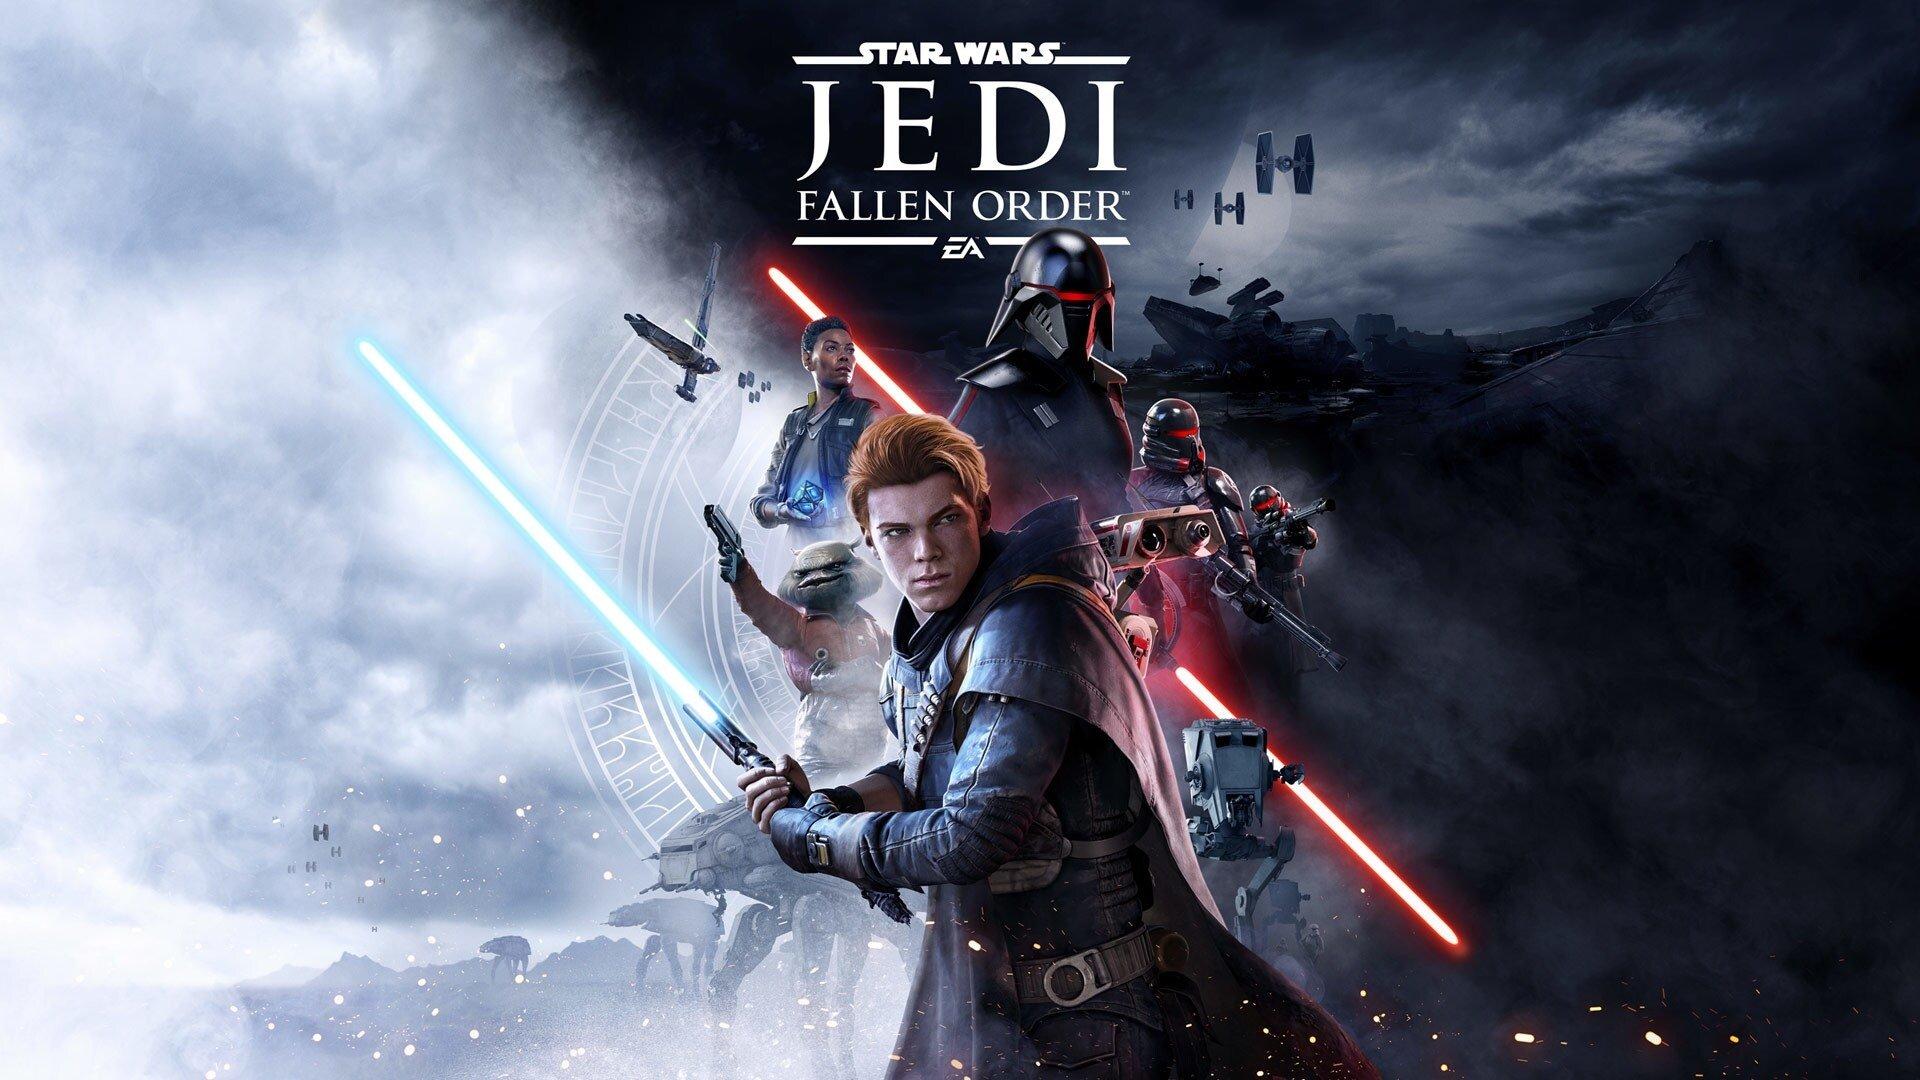 Обзор Star Wars Jedi: Fallen Order — на безрыбье и падаван джедай